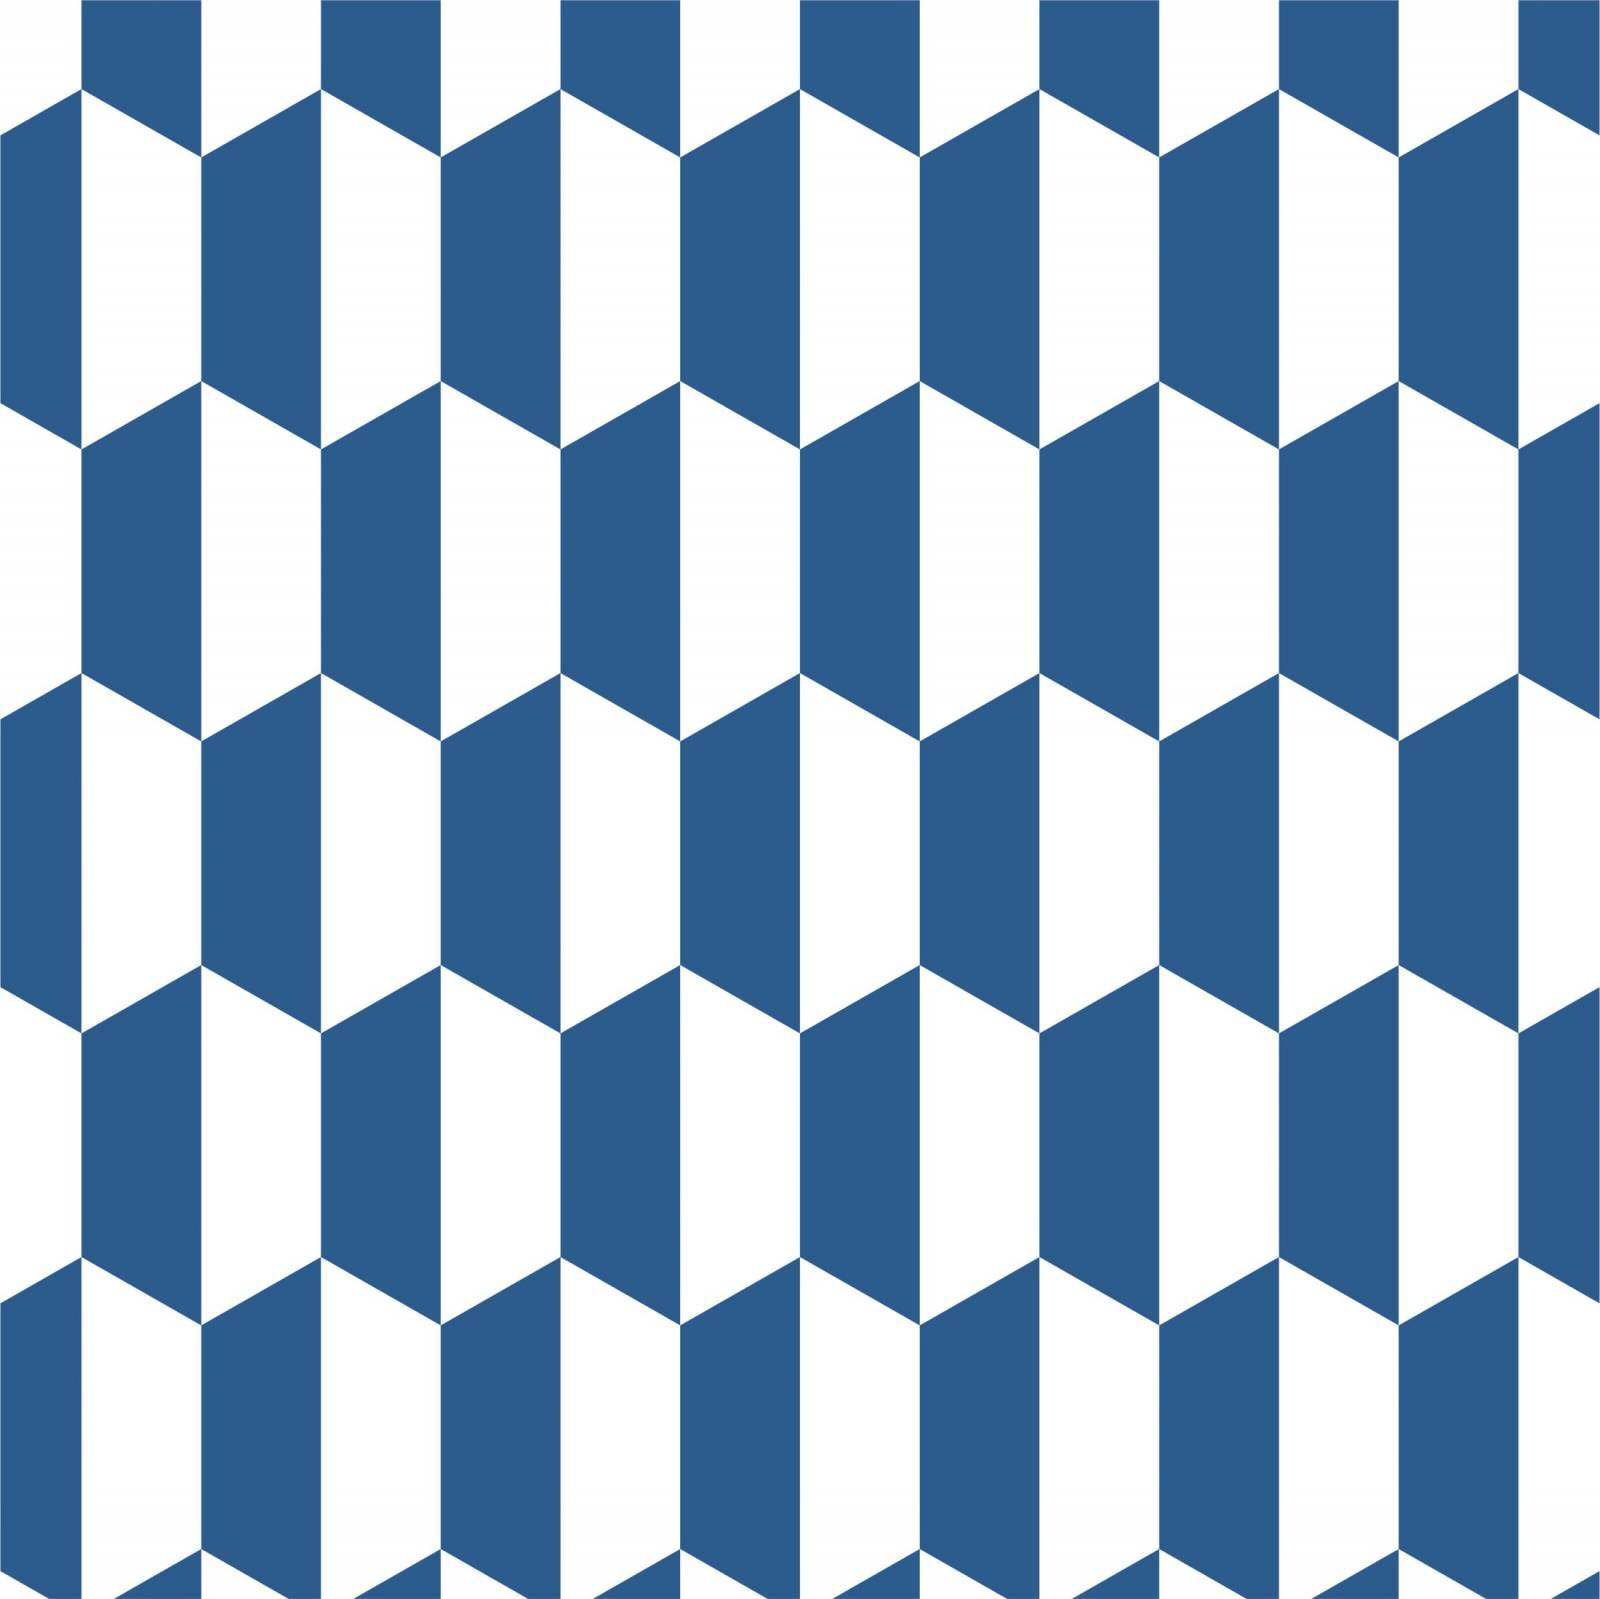 Papel de Parede Adesivo Geometrico Azul 3 /Rolo